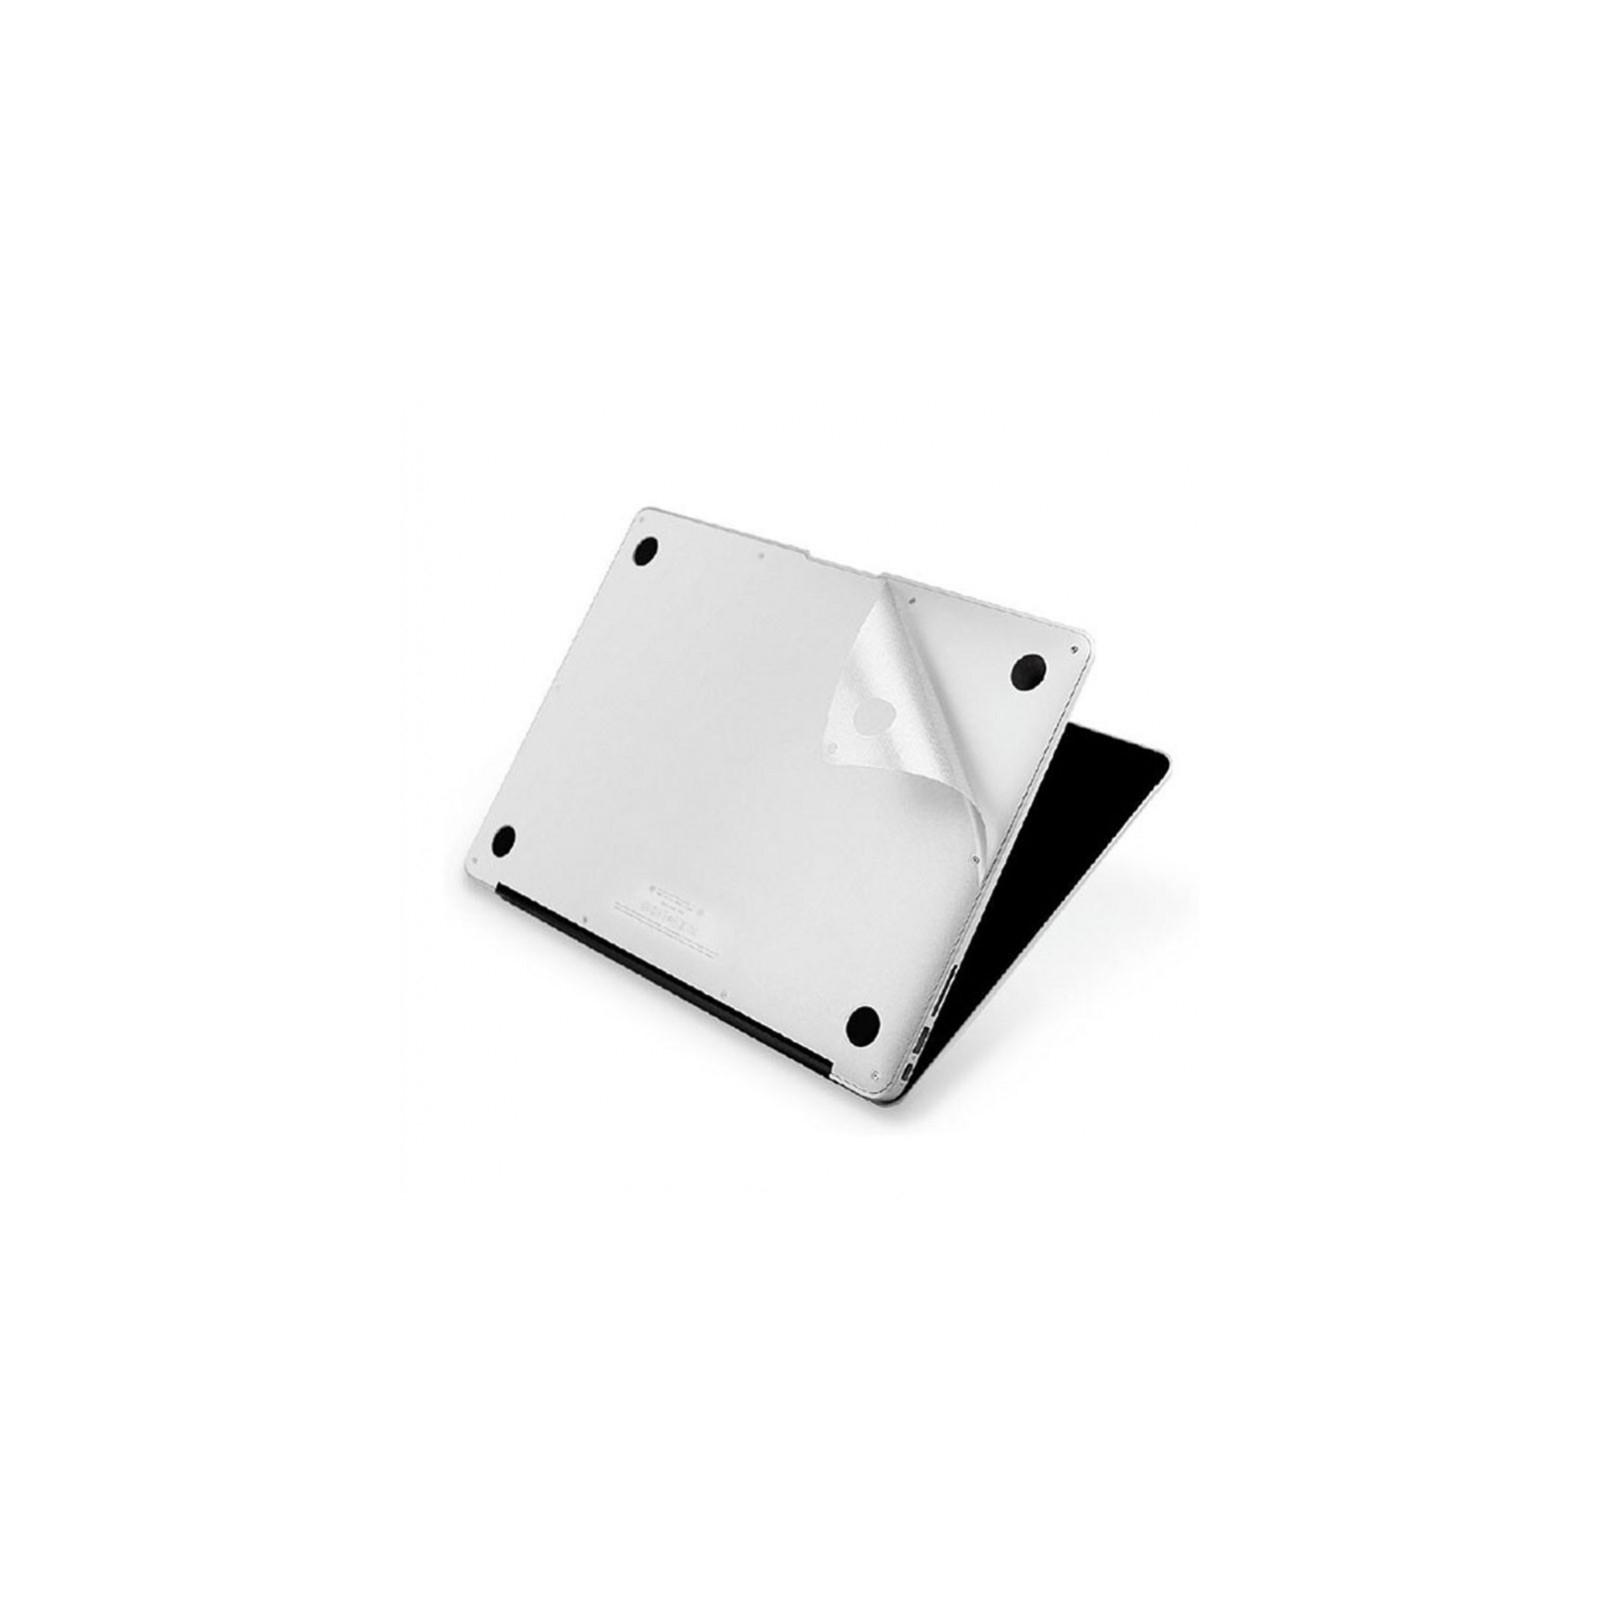 Пленка защитная JCPAL 3 in 1 set для MacBook Pro 13 (JCP2045) изображение 4